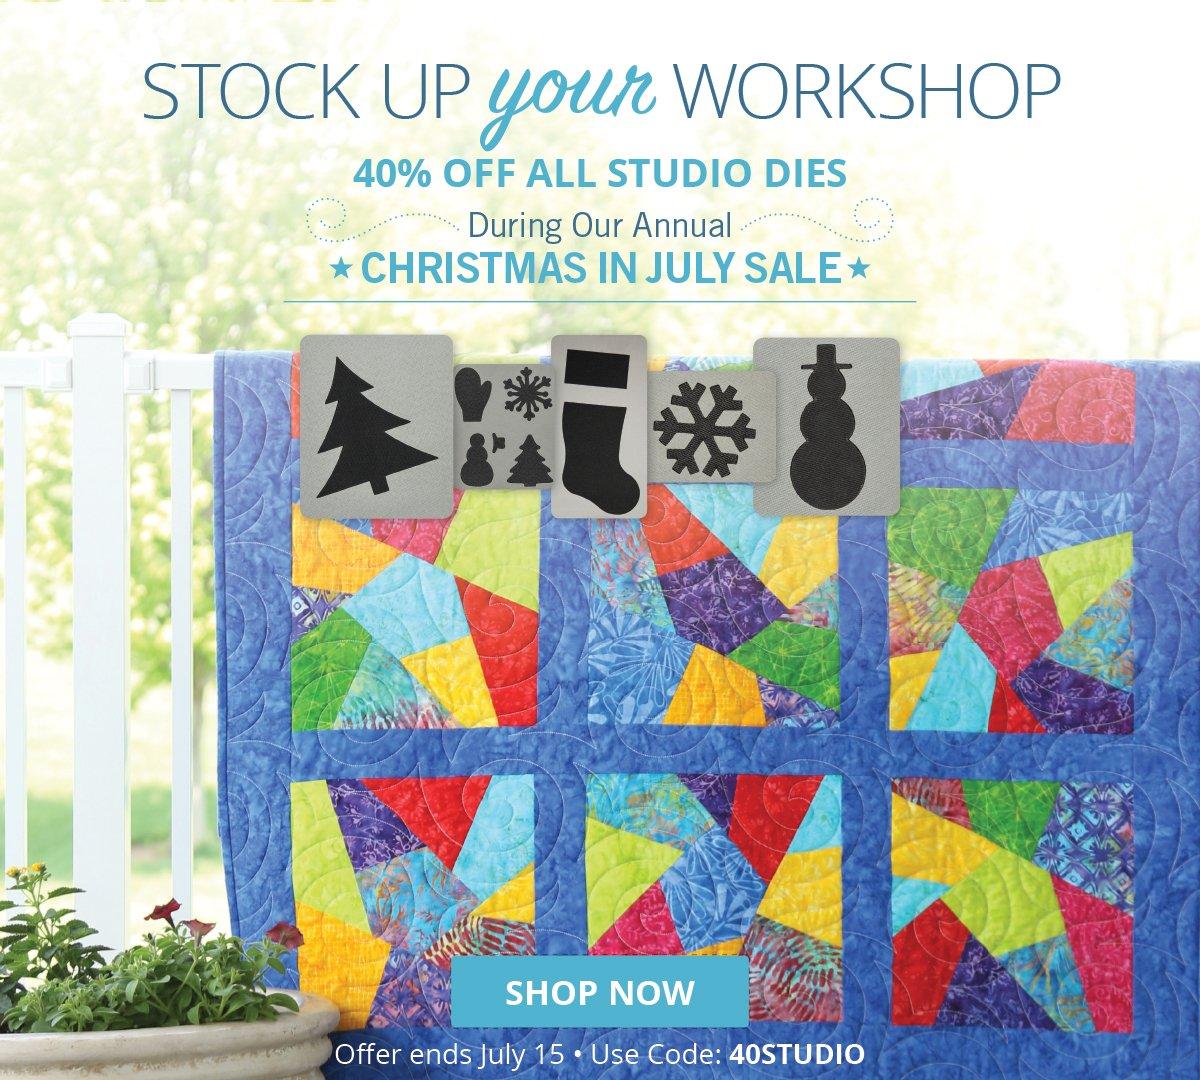 Stock Up Your Workshop | 40% Off All Studio Dies